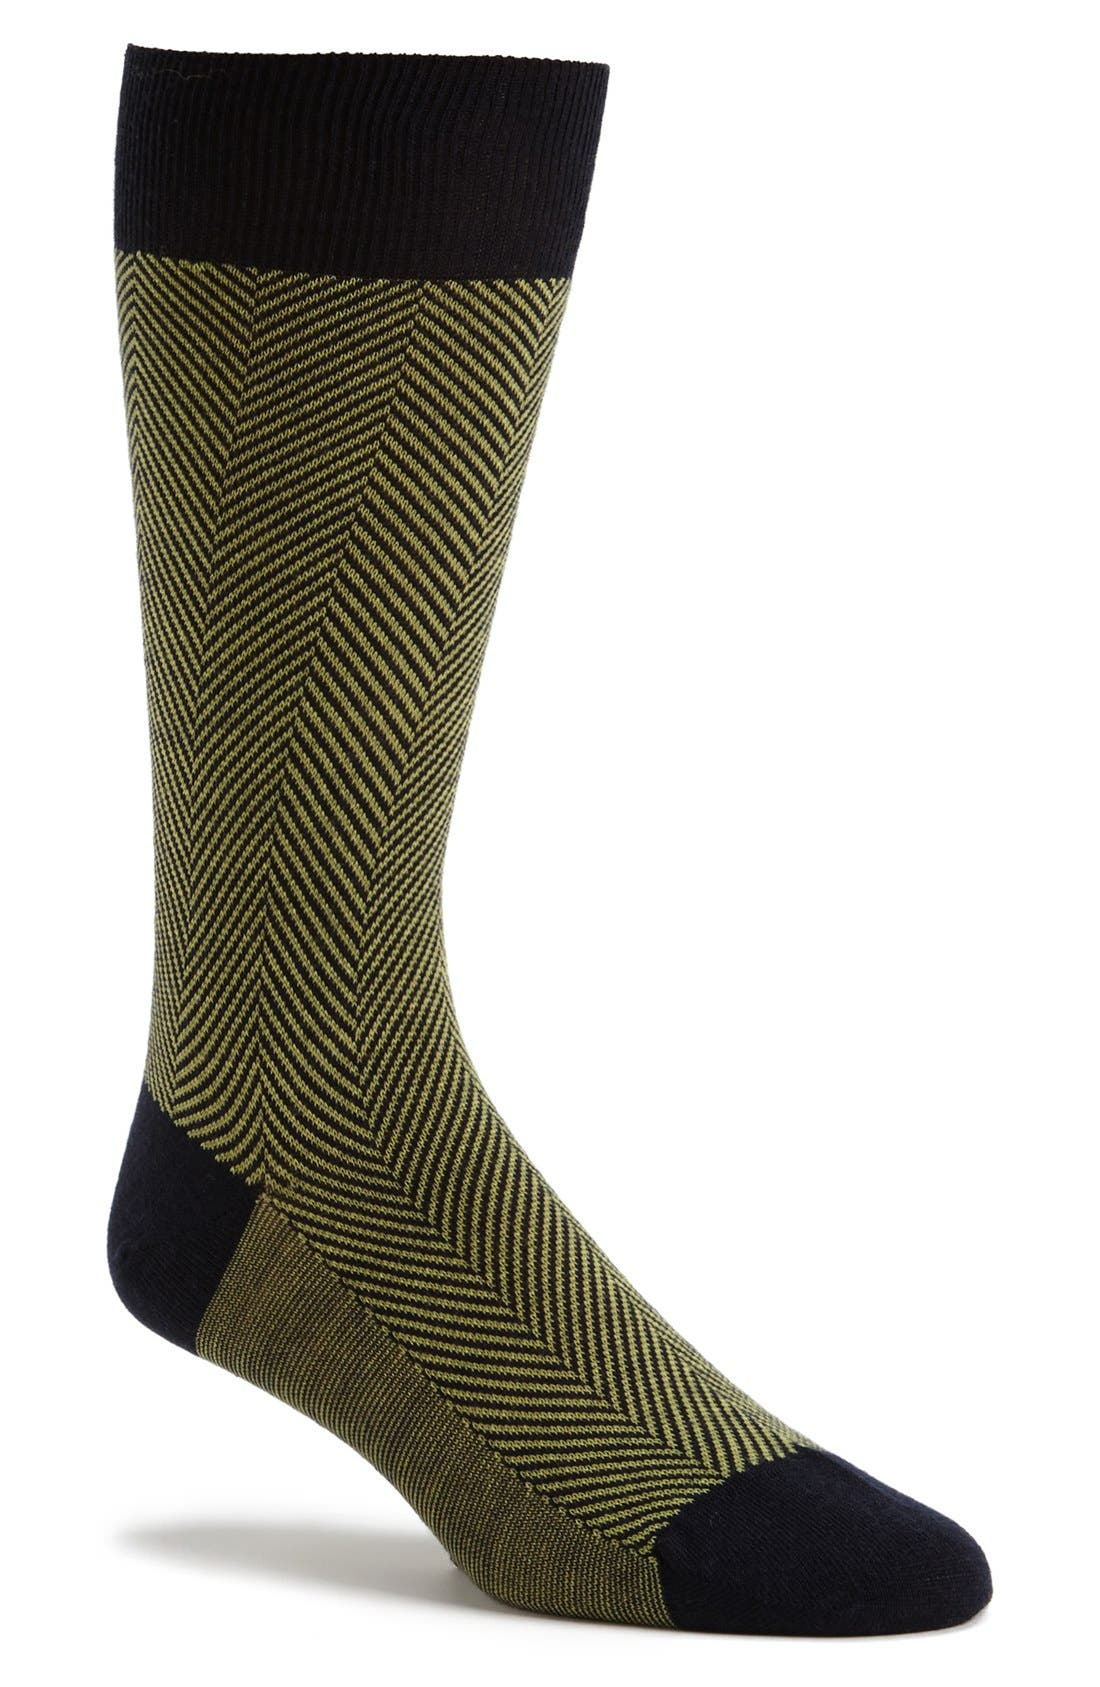 Alternate Image 1 Selected - Pantherella 'Hoxton' Herringbone Socks